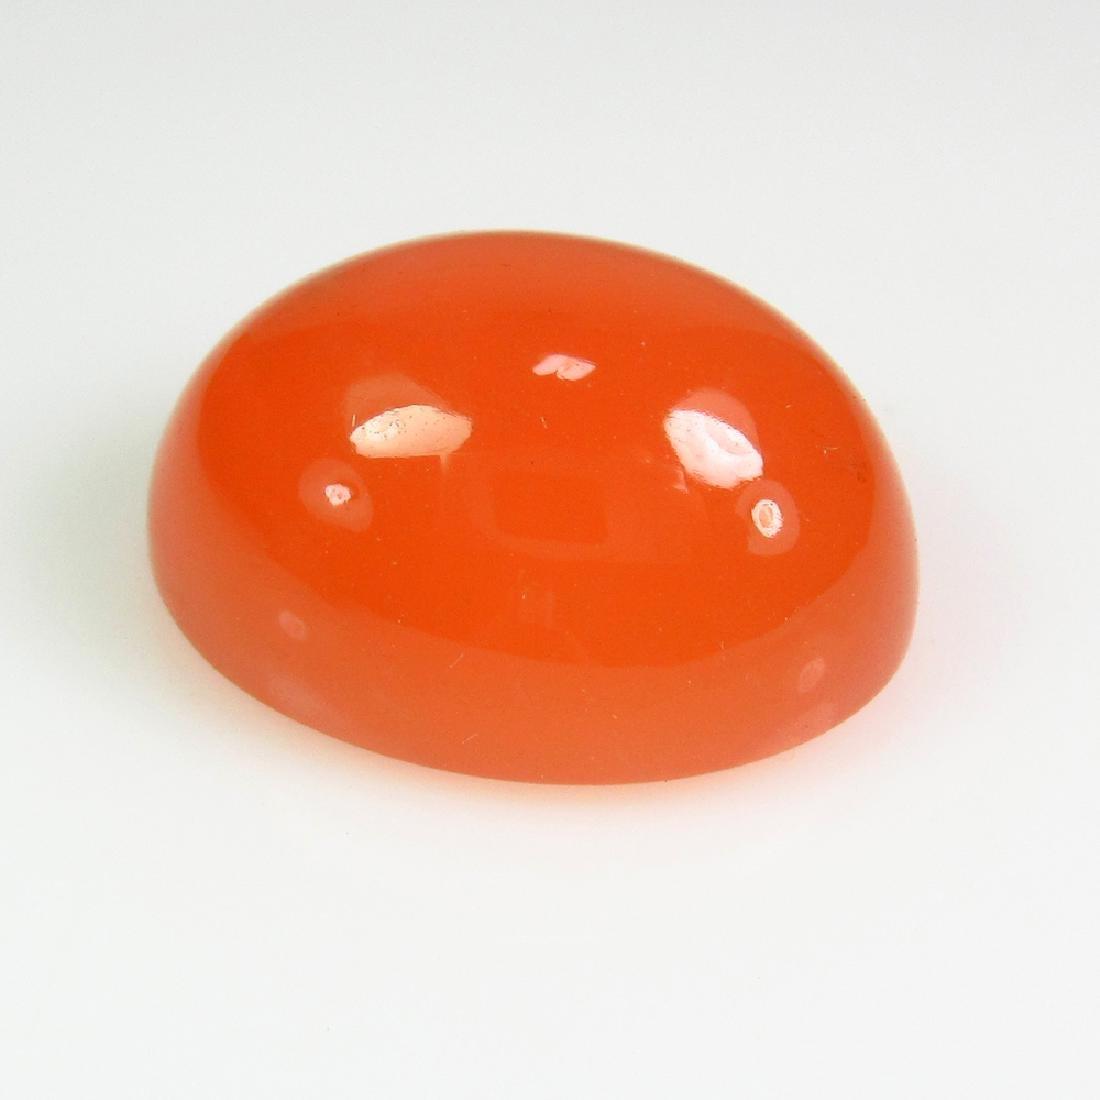 16.02 Ct Genuine Orange Moonstone Oval Cabochon